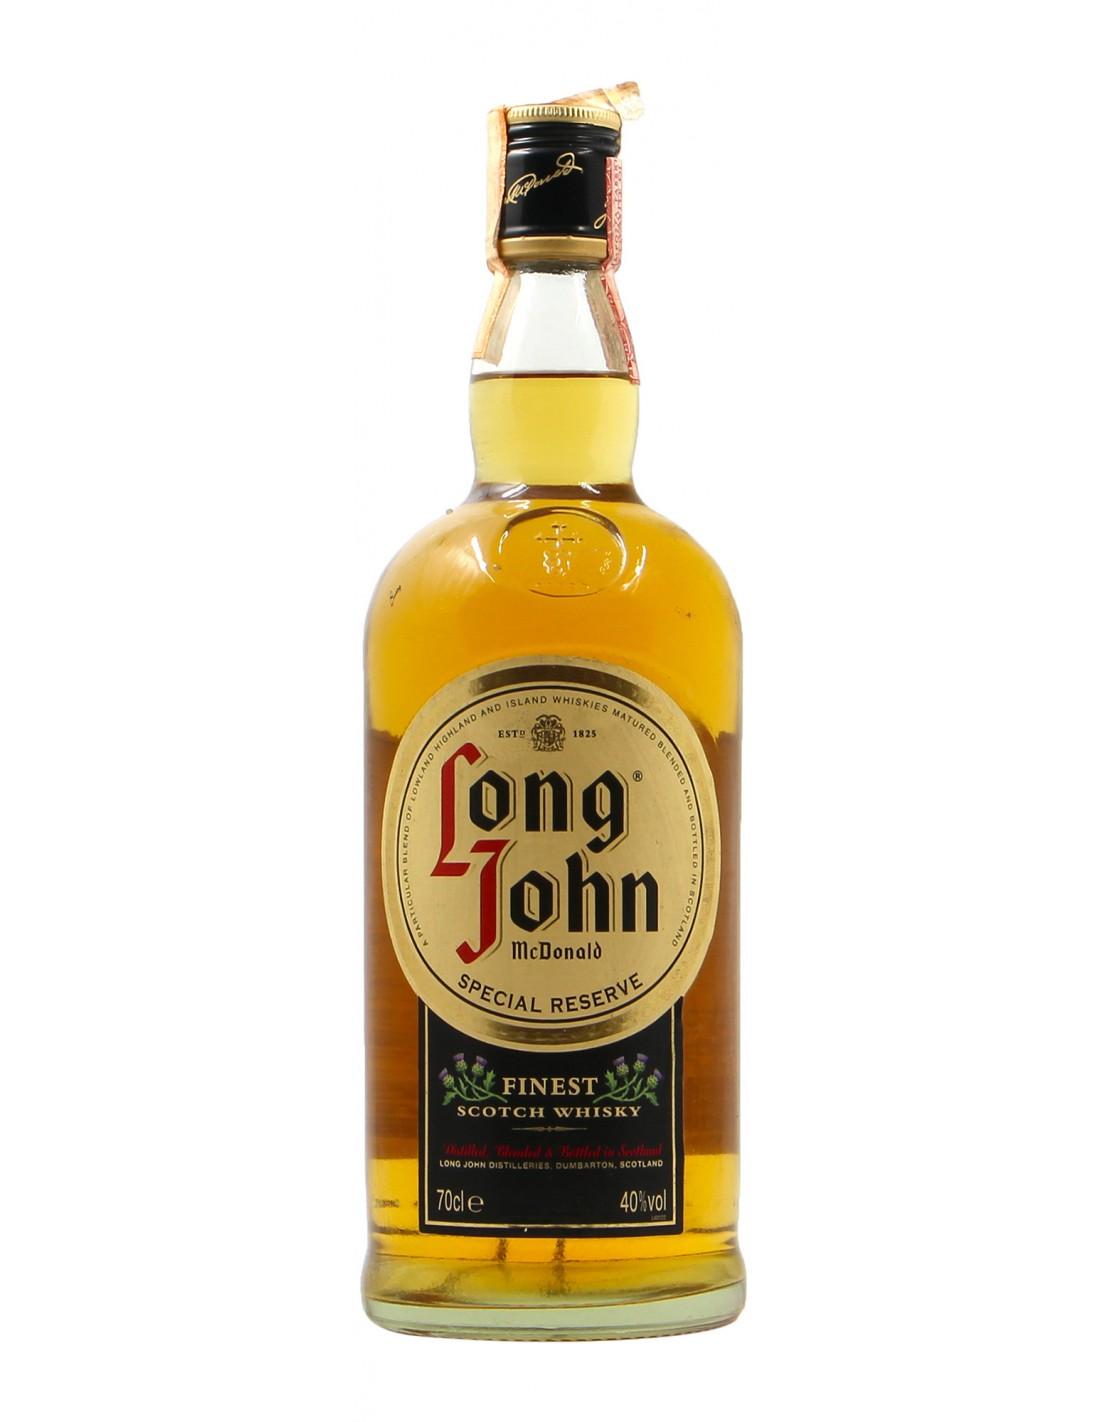 PARTICULAR SPECIAL RESERVE FINEST SCOTCH WHISKY 0.70 L 40 VOL NV LONG JOHN Grandi Bottiglie